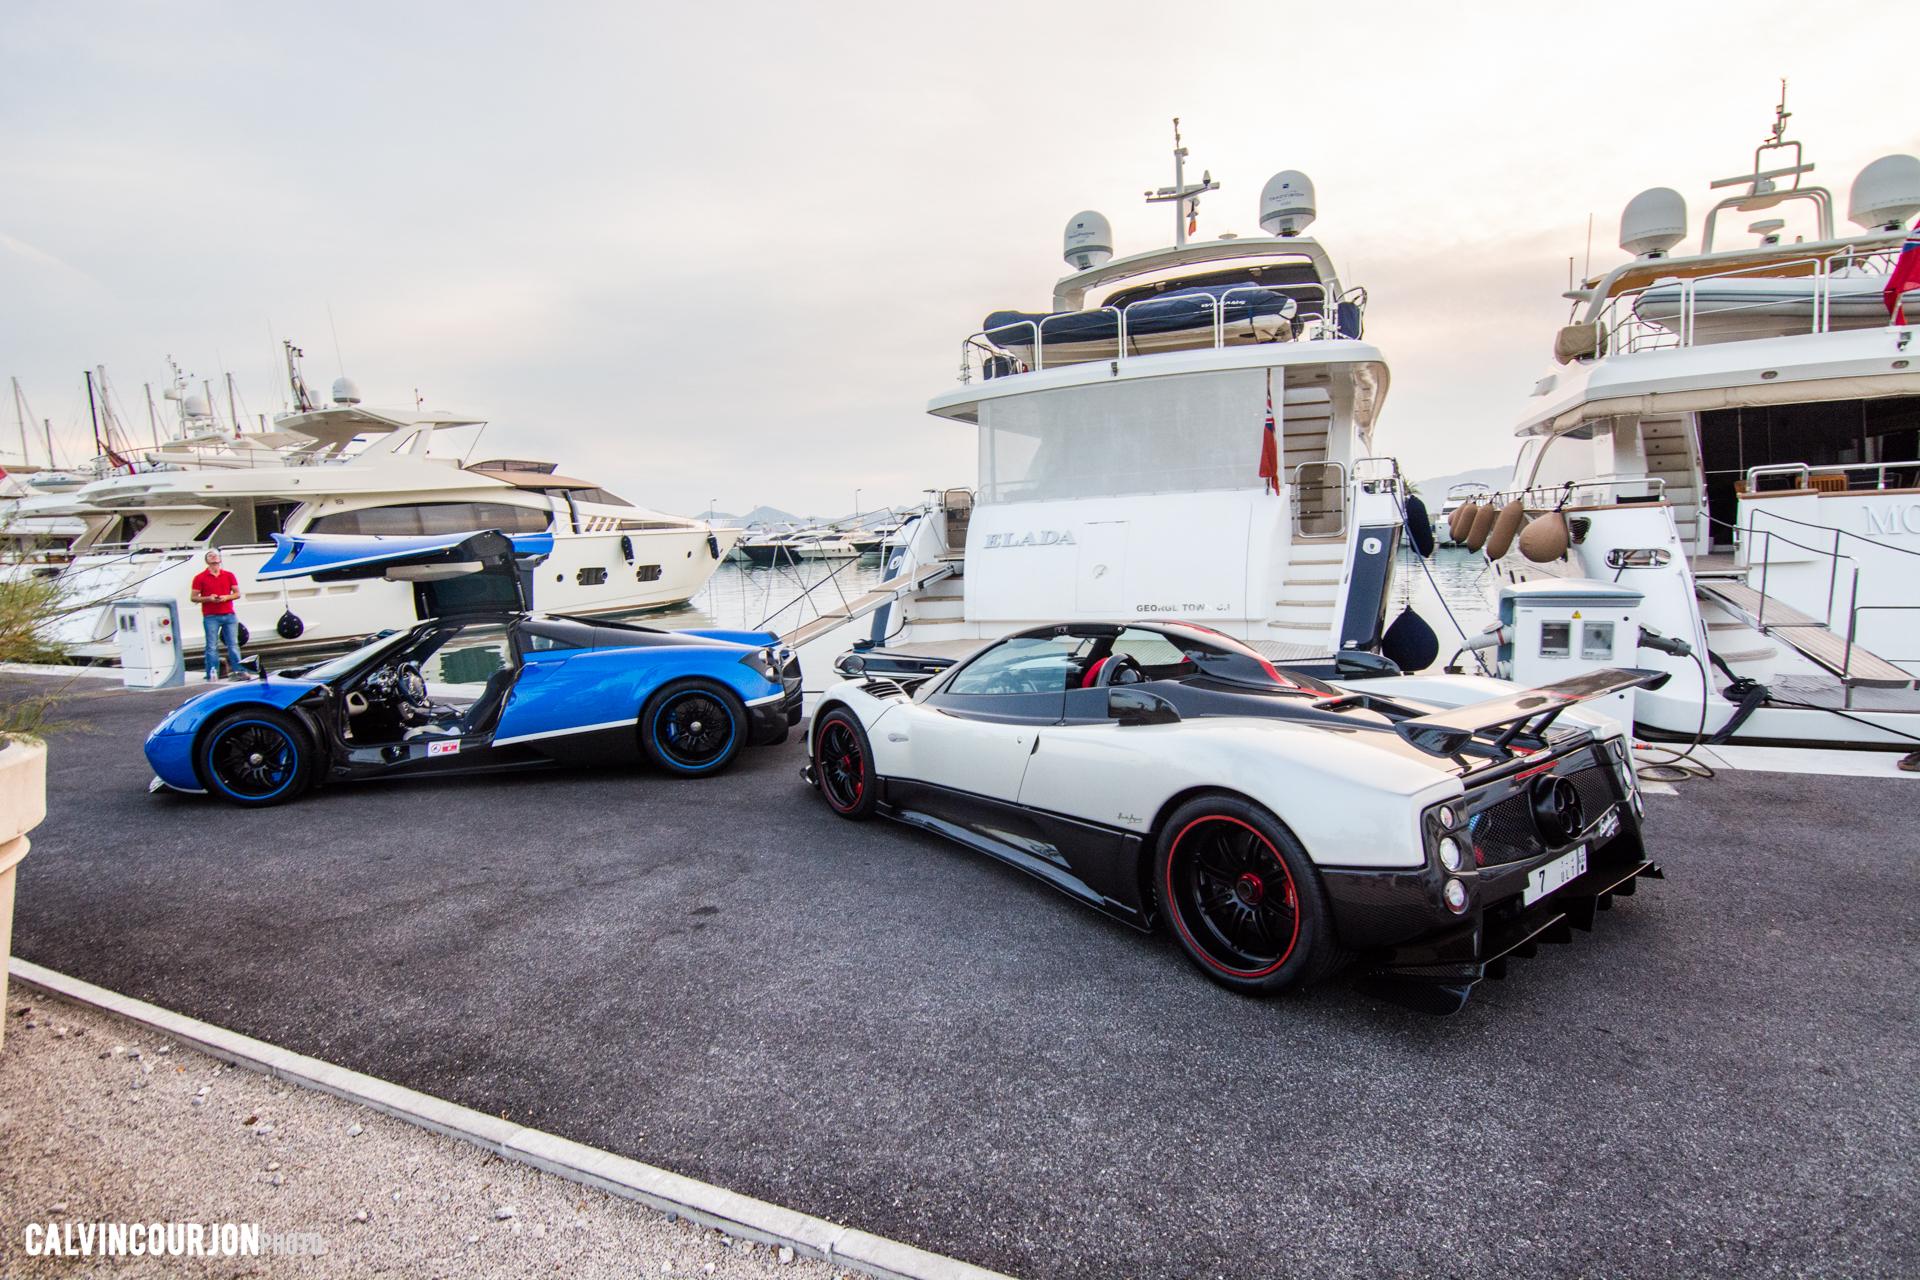 Pagani Zonda Cinque Roadster et Pagani Huayra - pose, pause au port - Cote dAzur - 2015 - Calvin Courjon